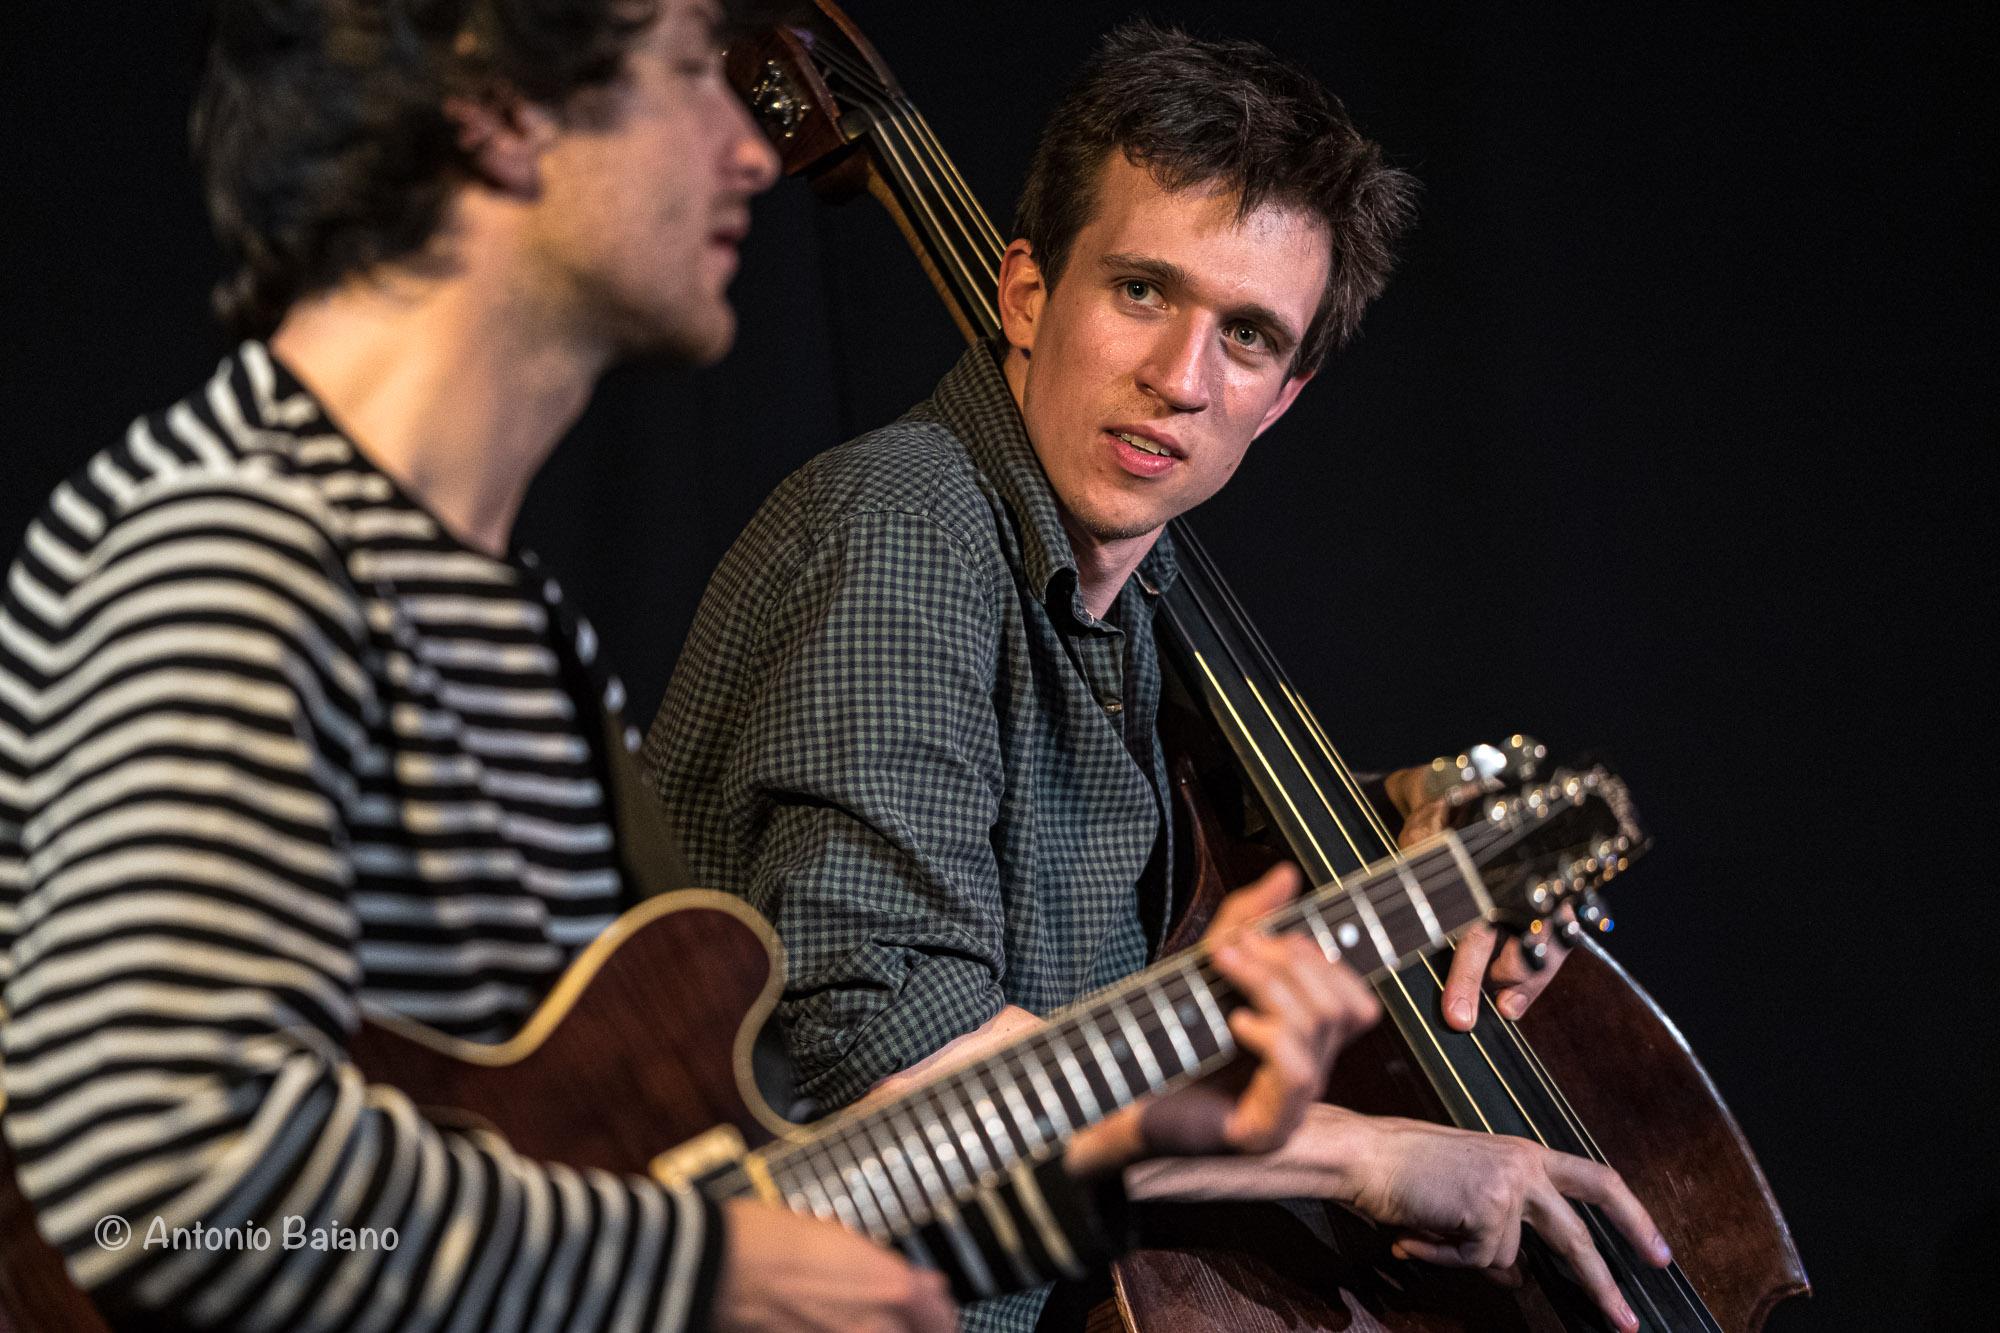 Misha Mullov-Abbado (bass) and Rob Luft